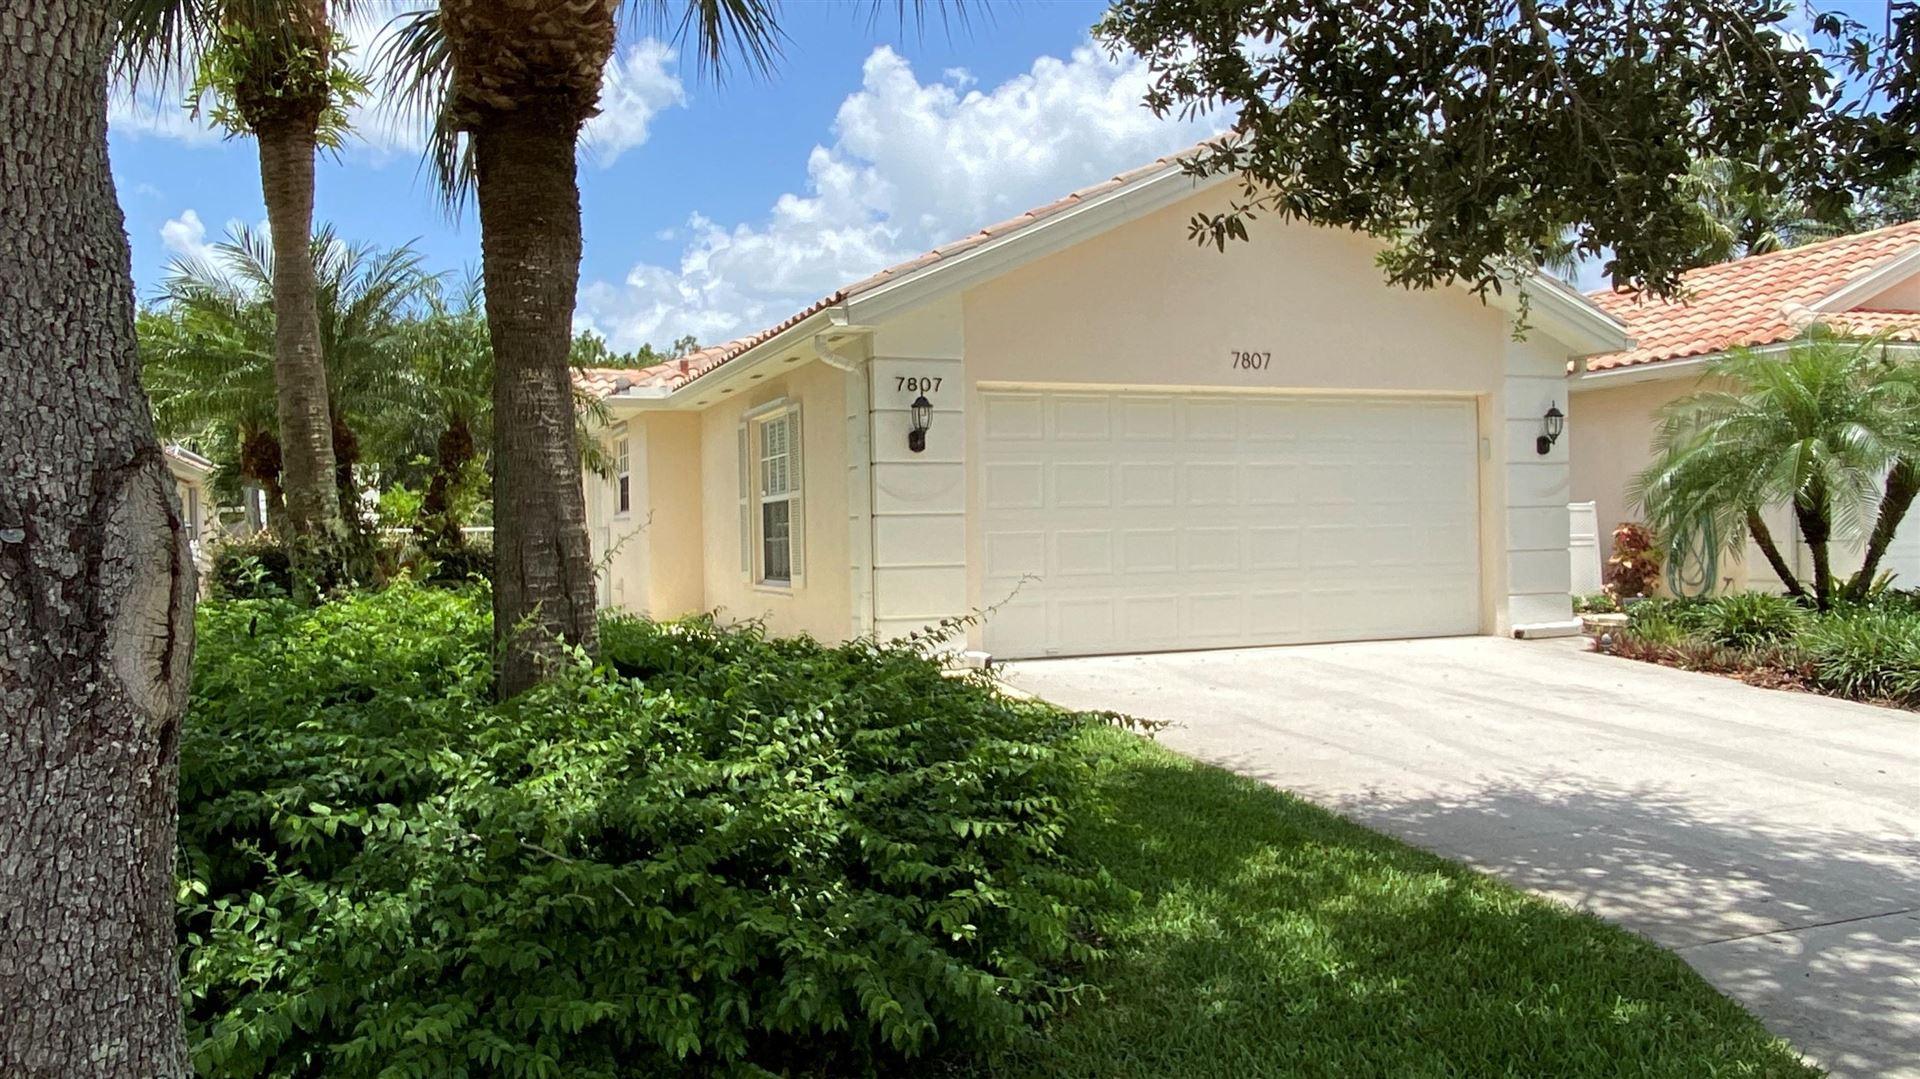 7807 N Fork Drive, West Palm Beach, FL 33411 - #: RX-10635643